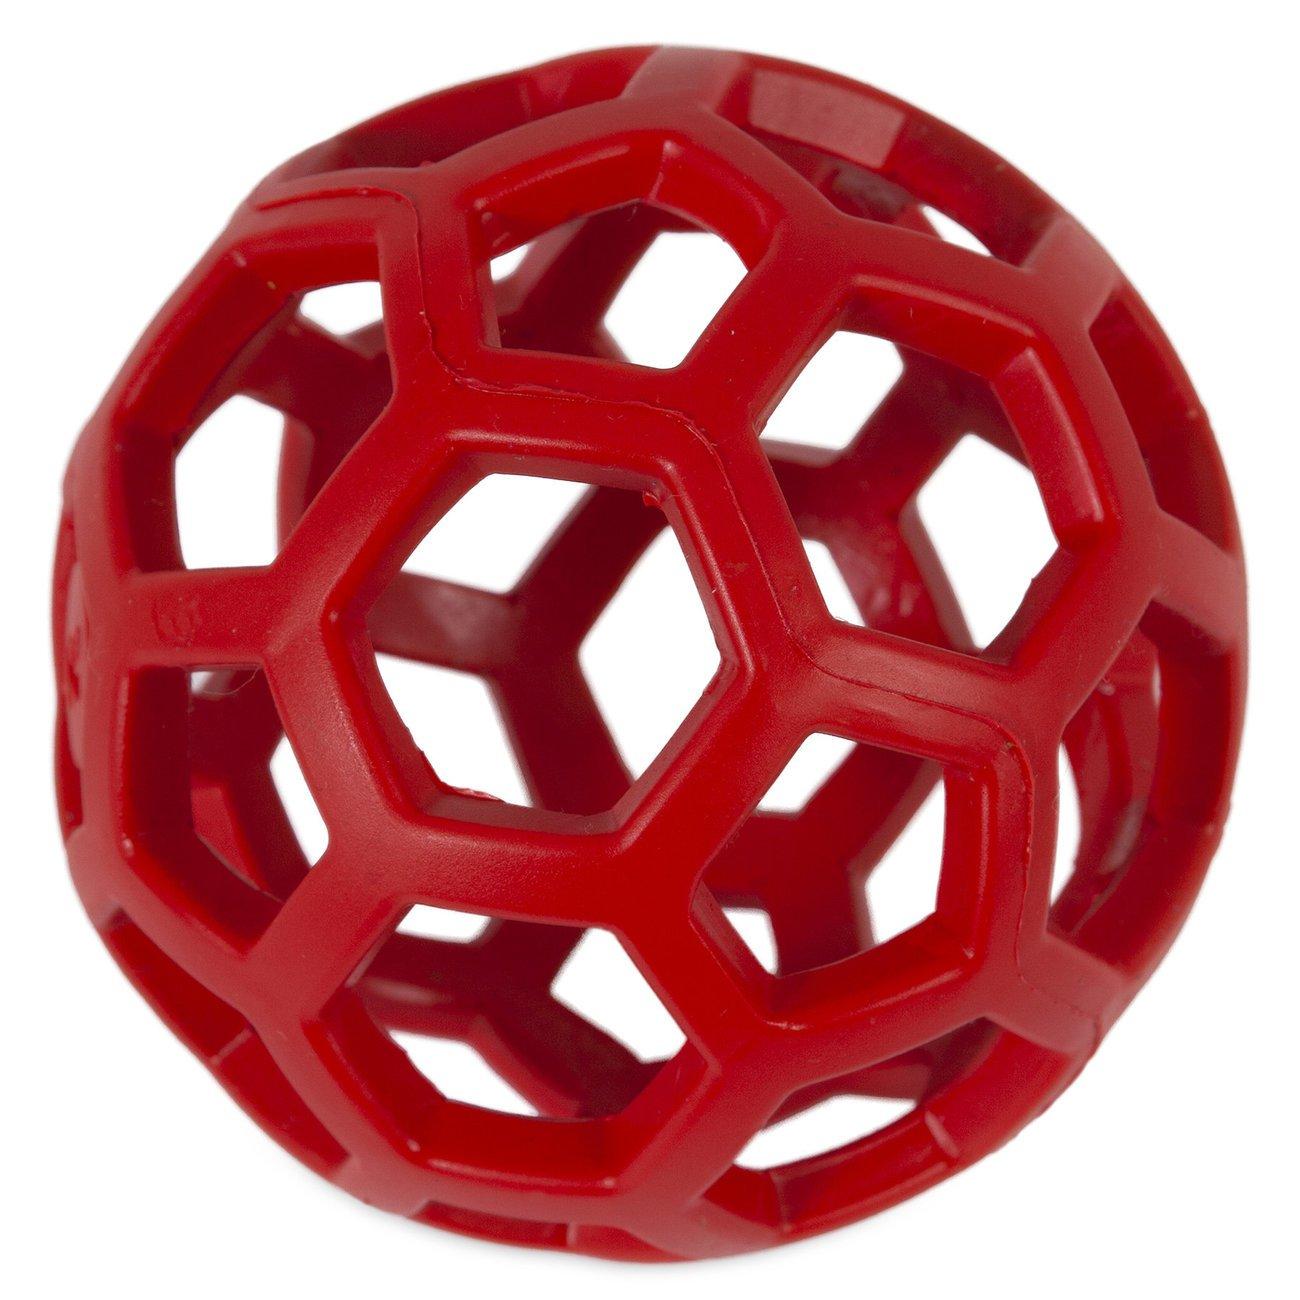 JW Pet HOL-EE Roller Lochball für Hunde